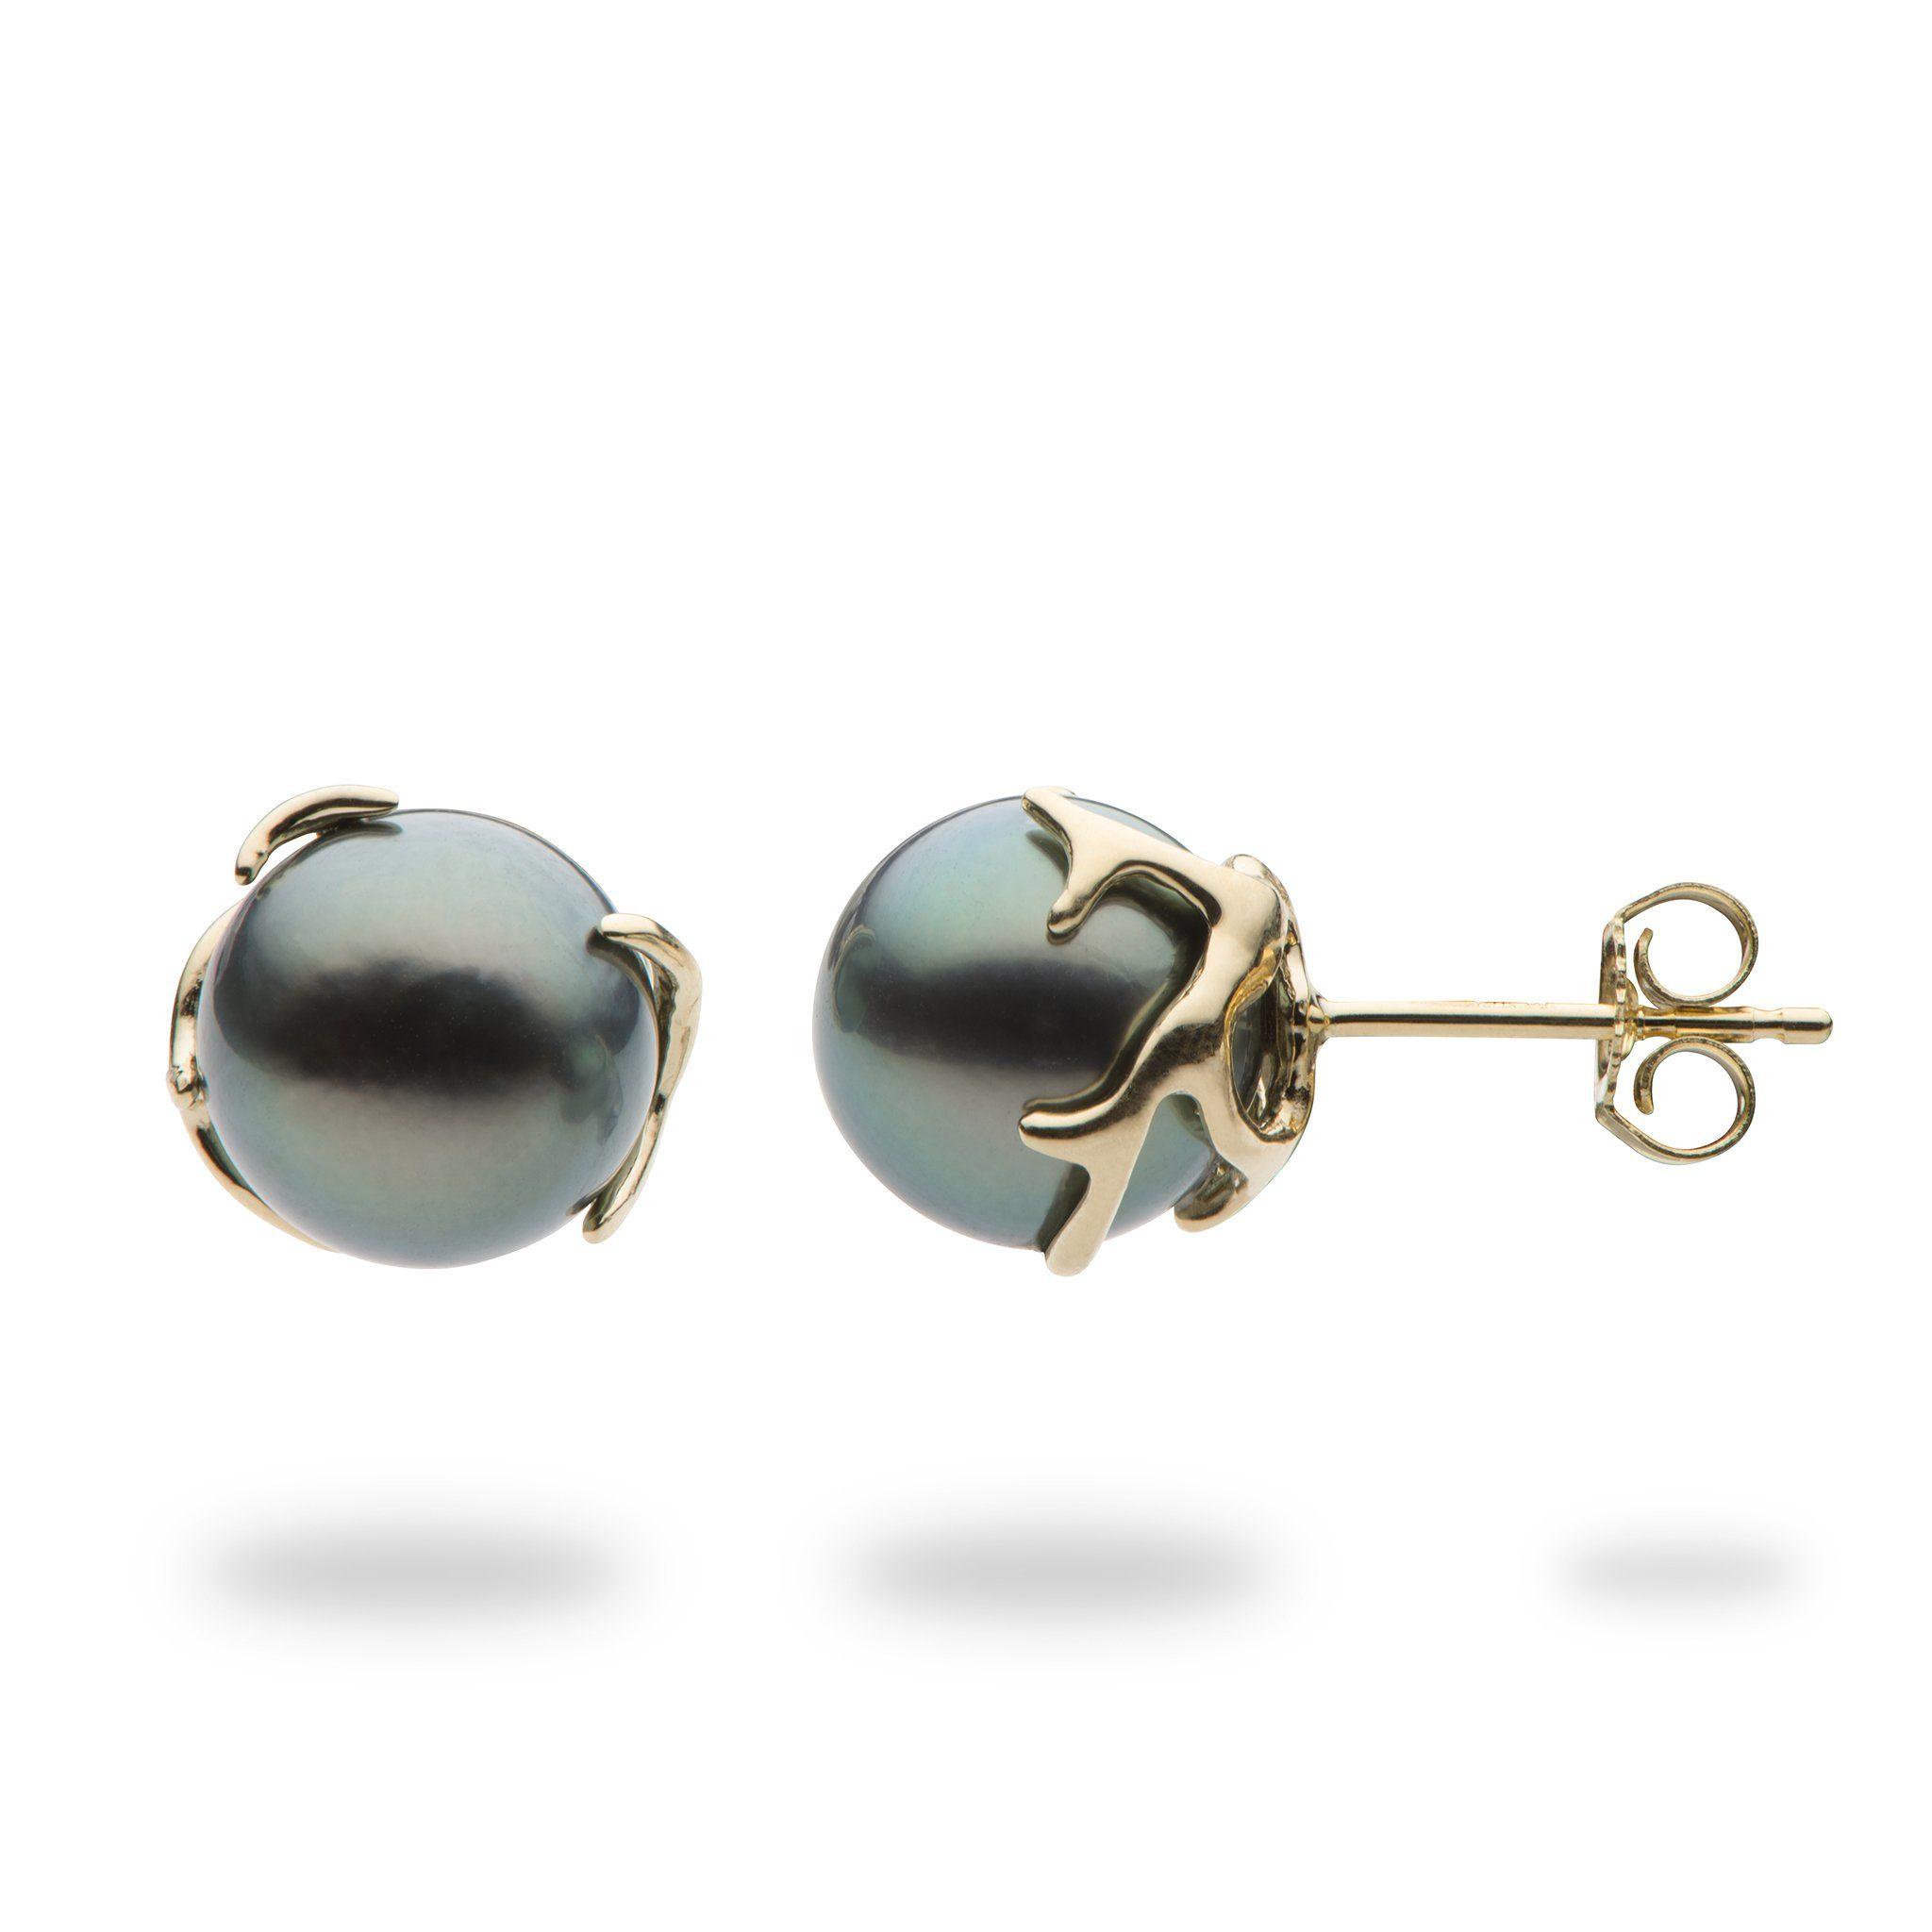 Hawaiian Heritage Tahitian Pearl Earrings In 14k Yellow Gold 9 10mm In 2020 Tahitian Pearl Earrings Black Pearl Earrings 14k Yellow Gold Stud Earrings